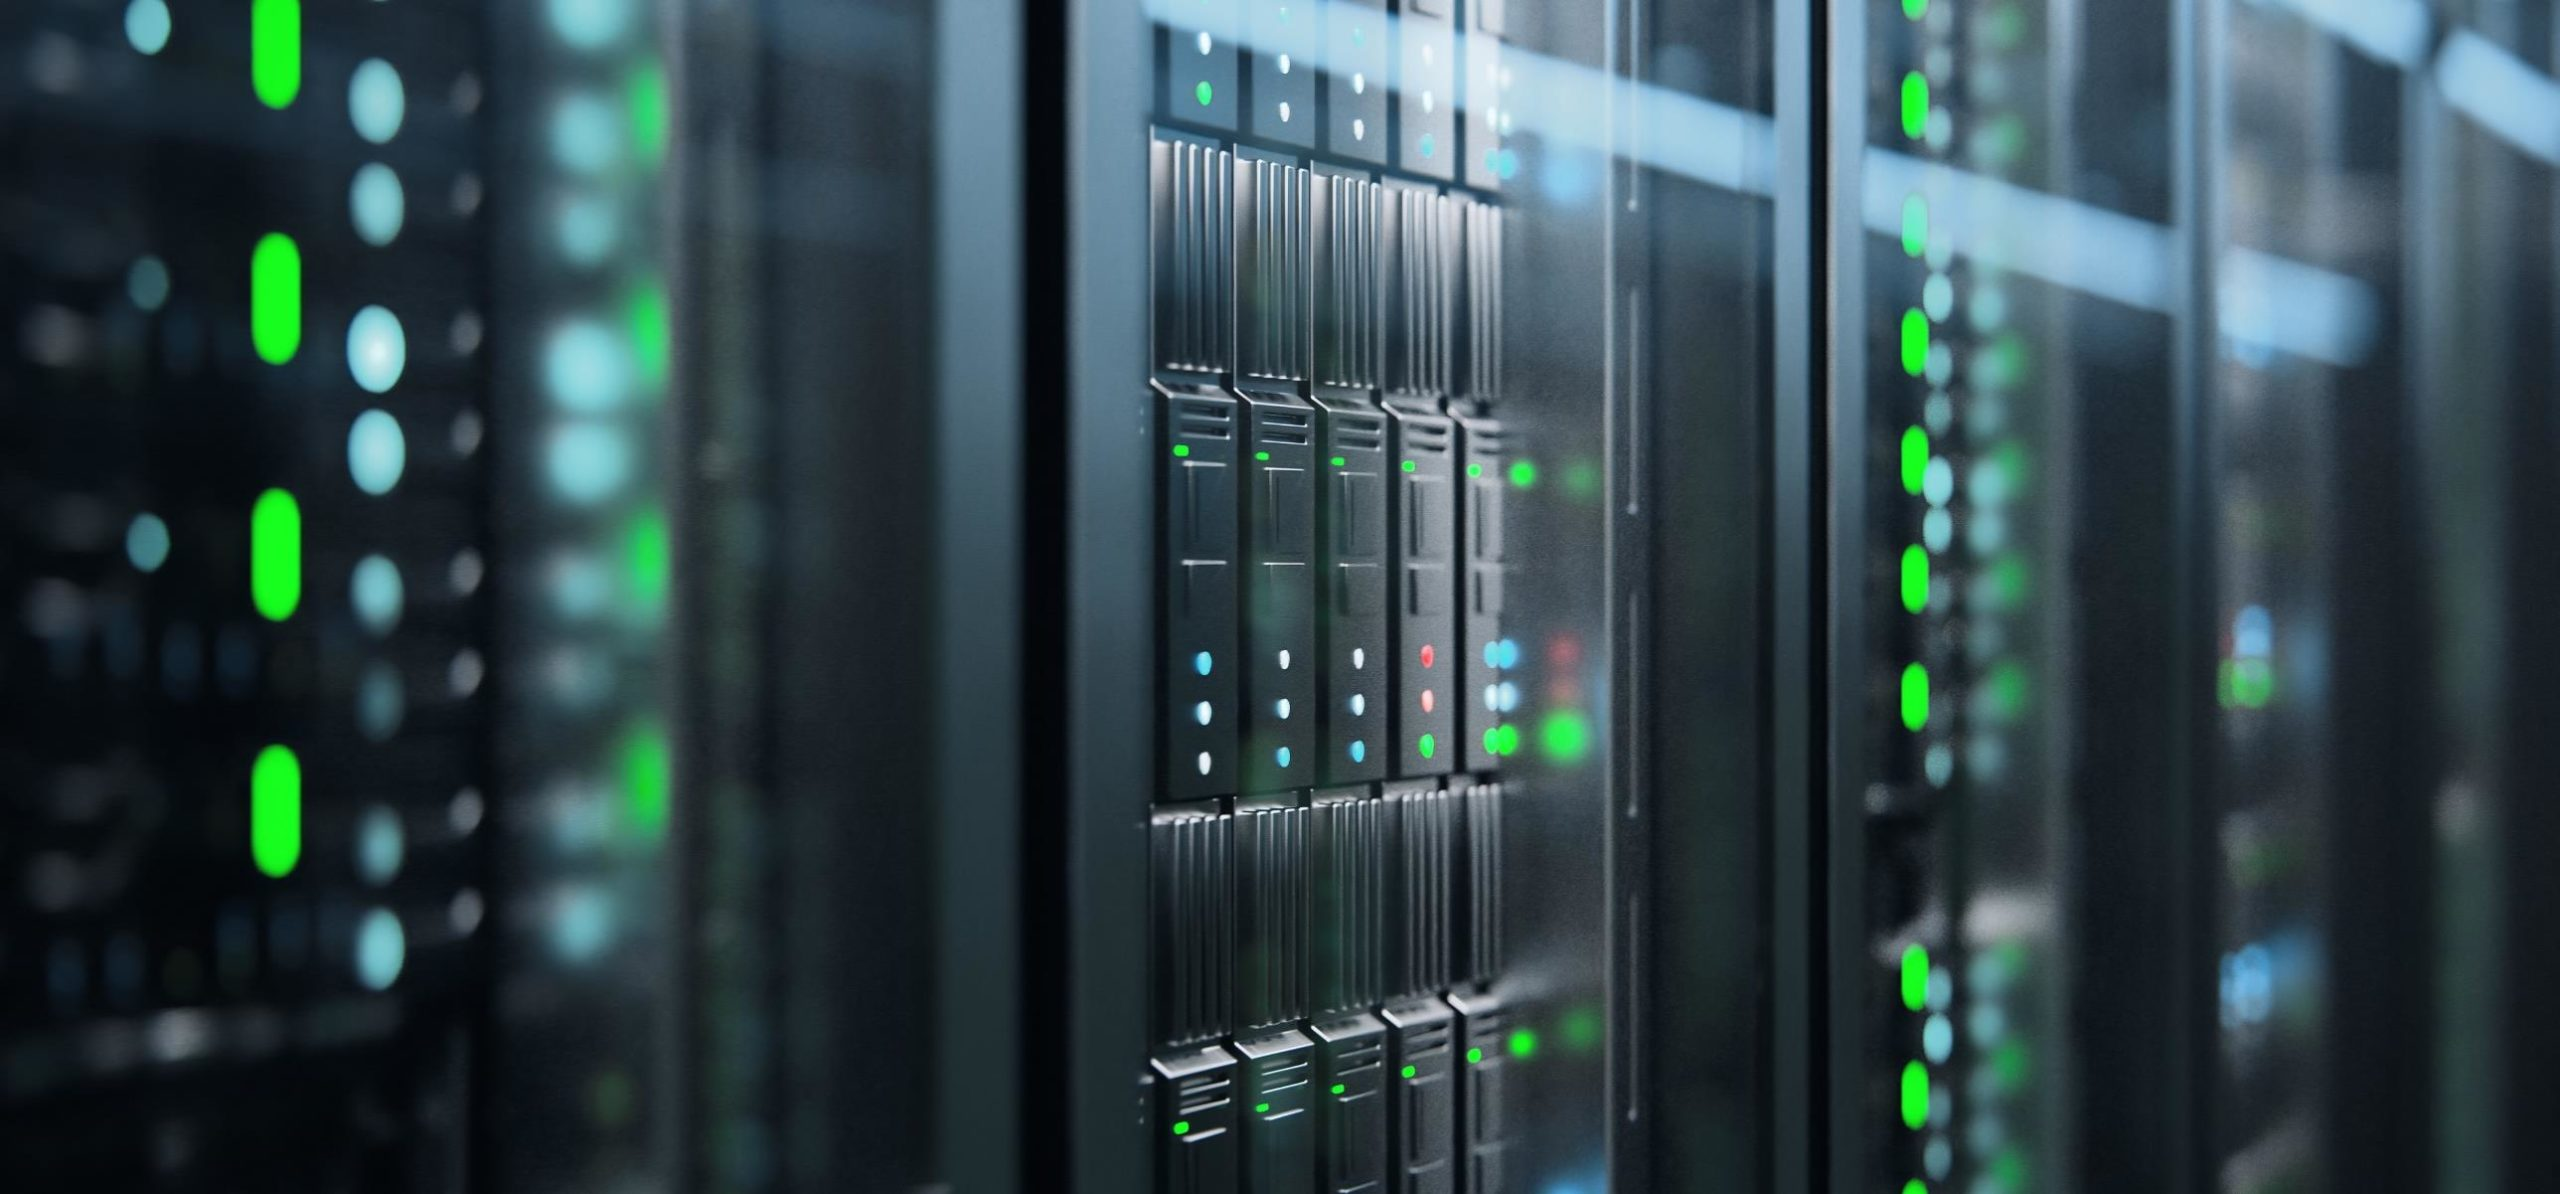 CBRE publishes European Data Centers Q2 2021